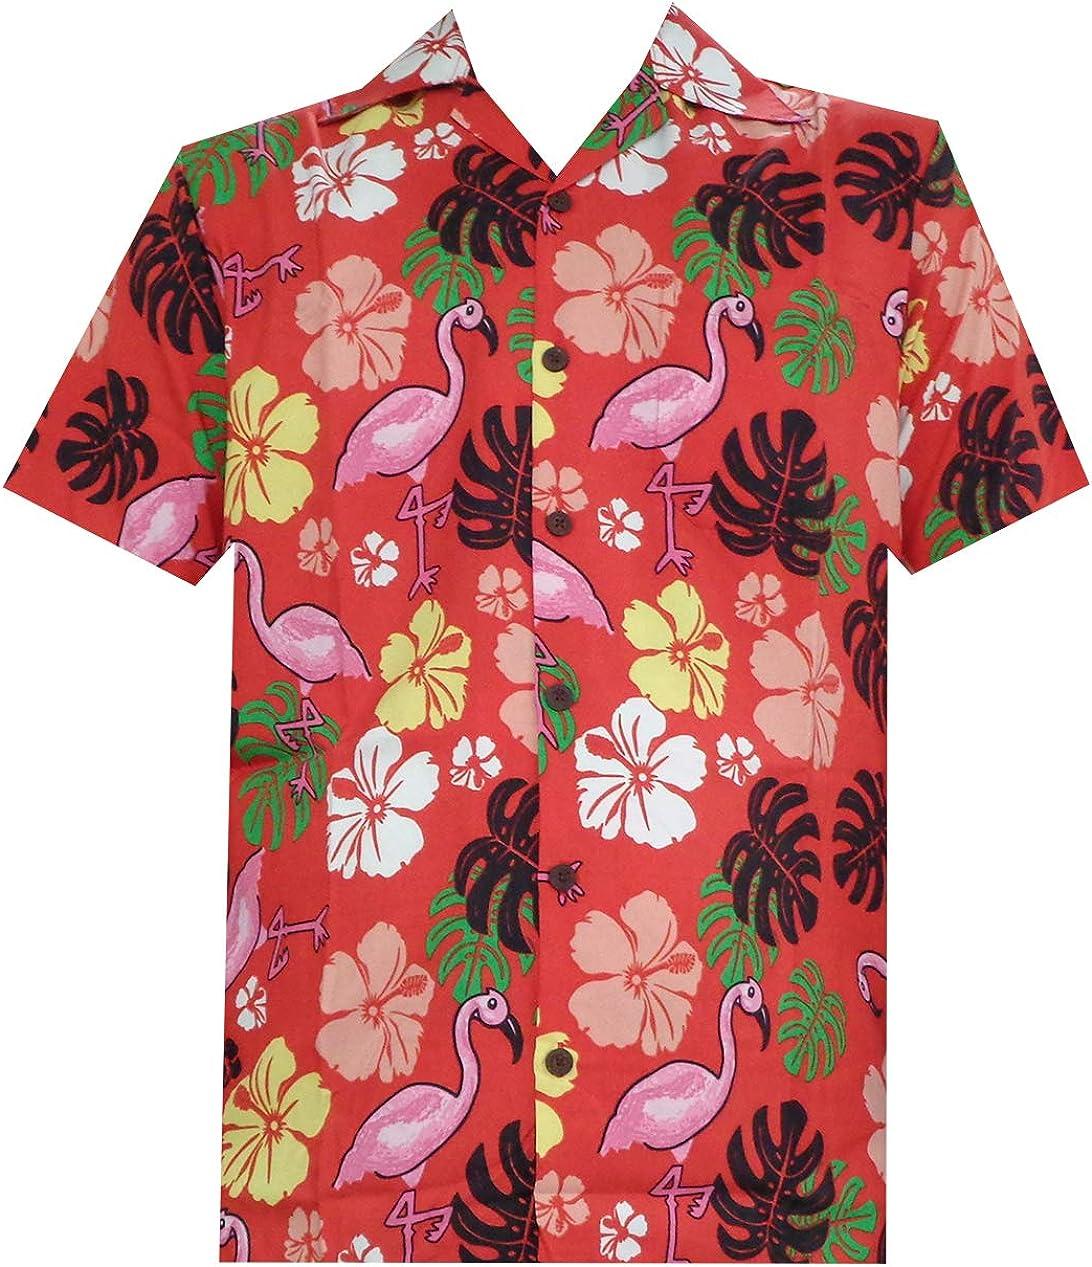 ALVISH Camisas hawaianas de flamenco rosa para hombre, ropa de playa, fiesta, casual, camping, botones, manga corta - rojo - Small